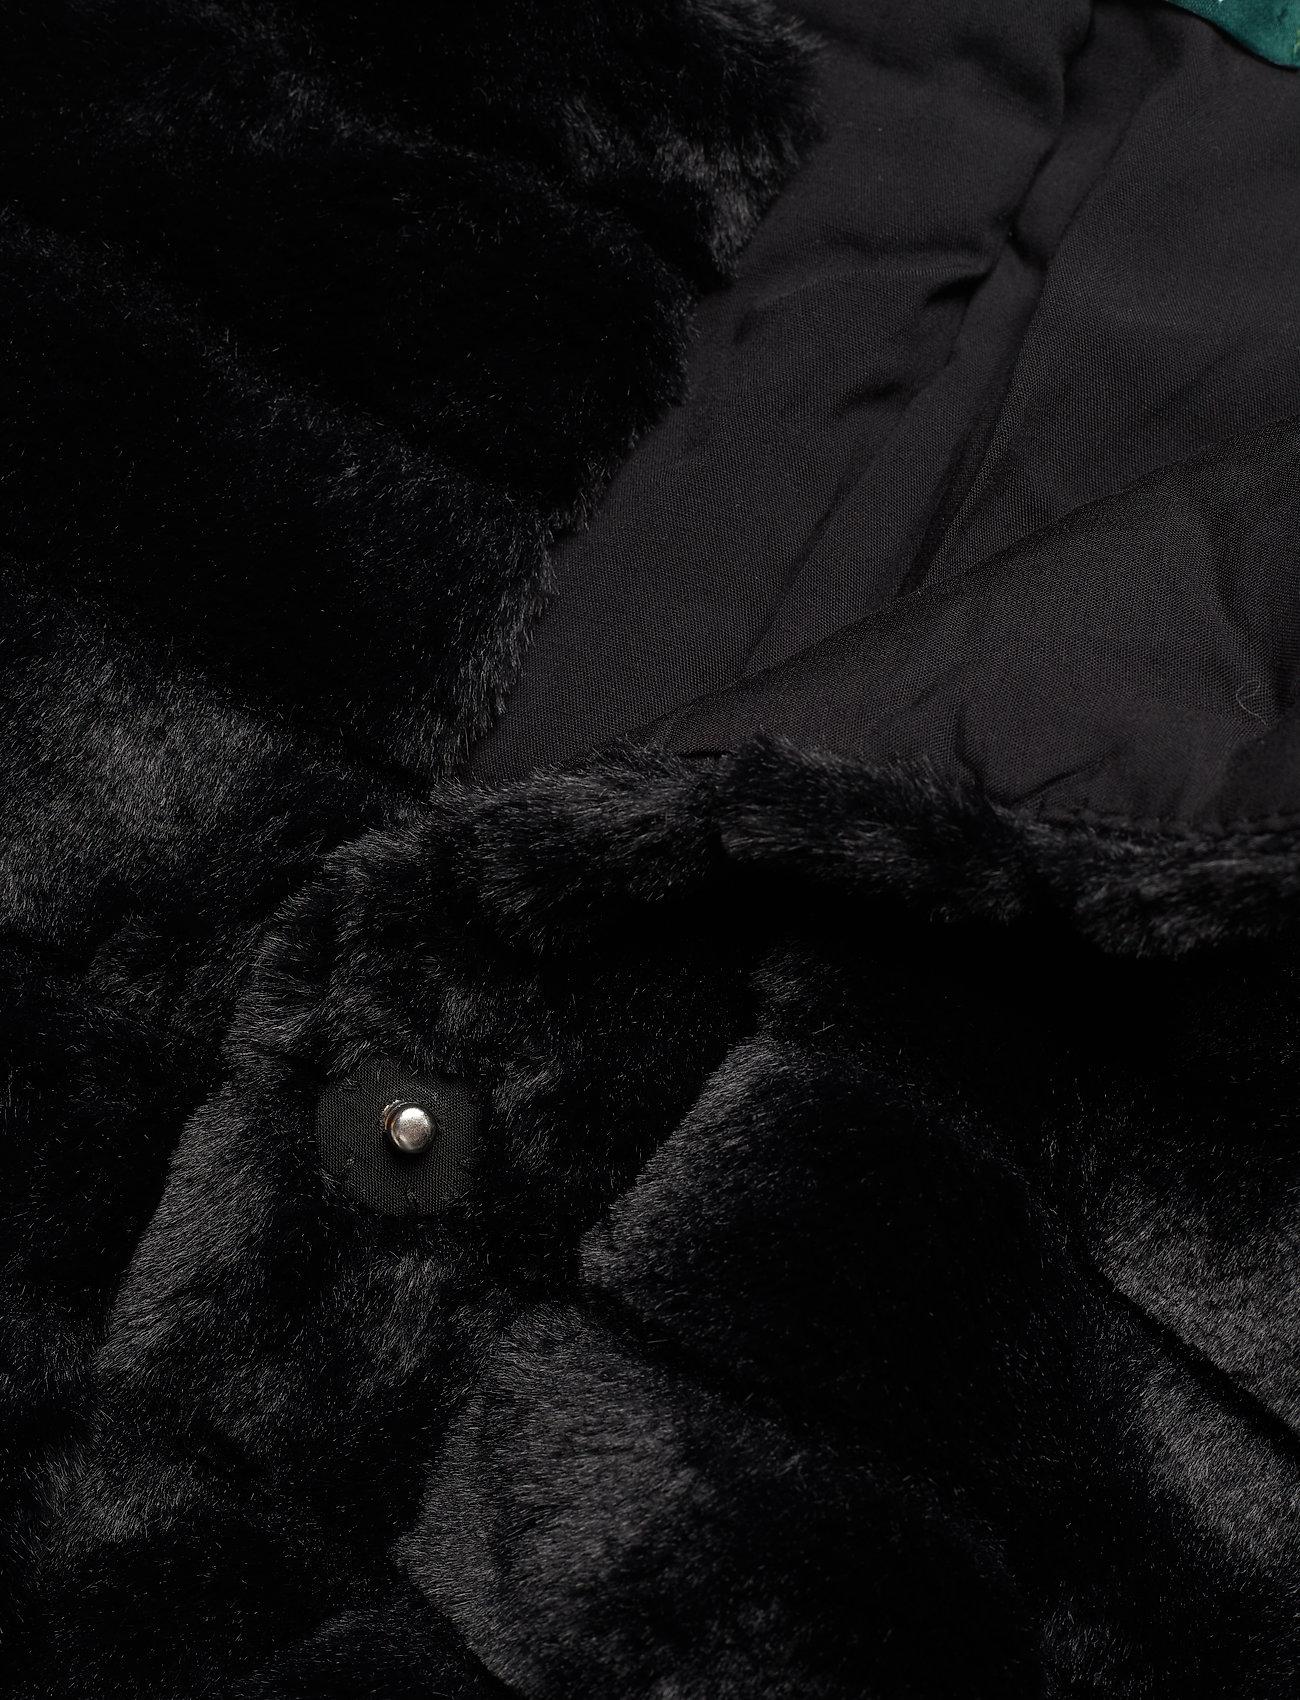 WThin StaLauren Ralph Chubby Faux fur Coatblack yvN8nwOPm0